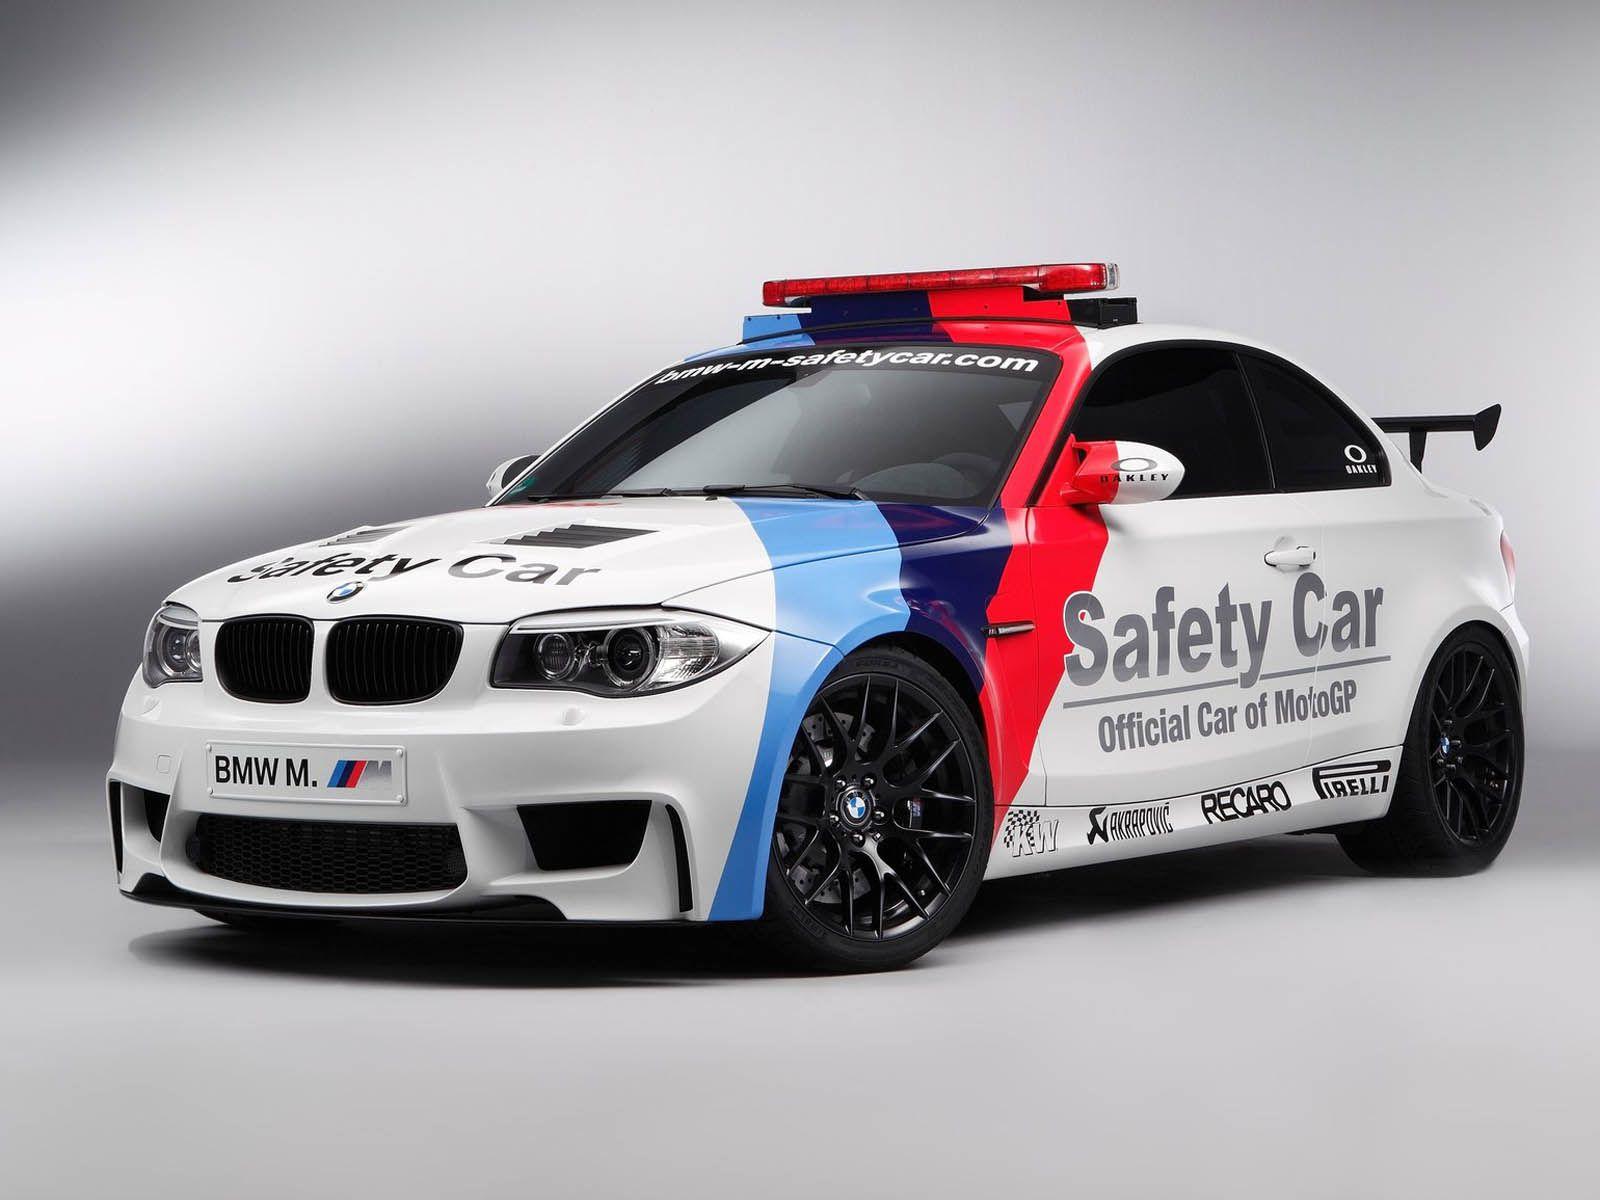 MotoGP Safety Car Car safety, Bmw 1 series, Bmw